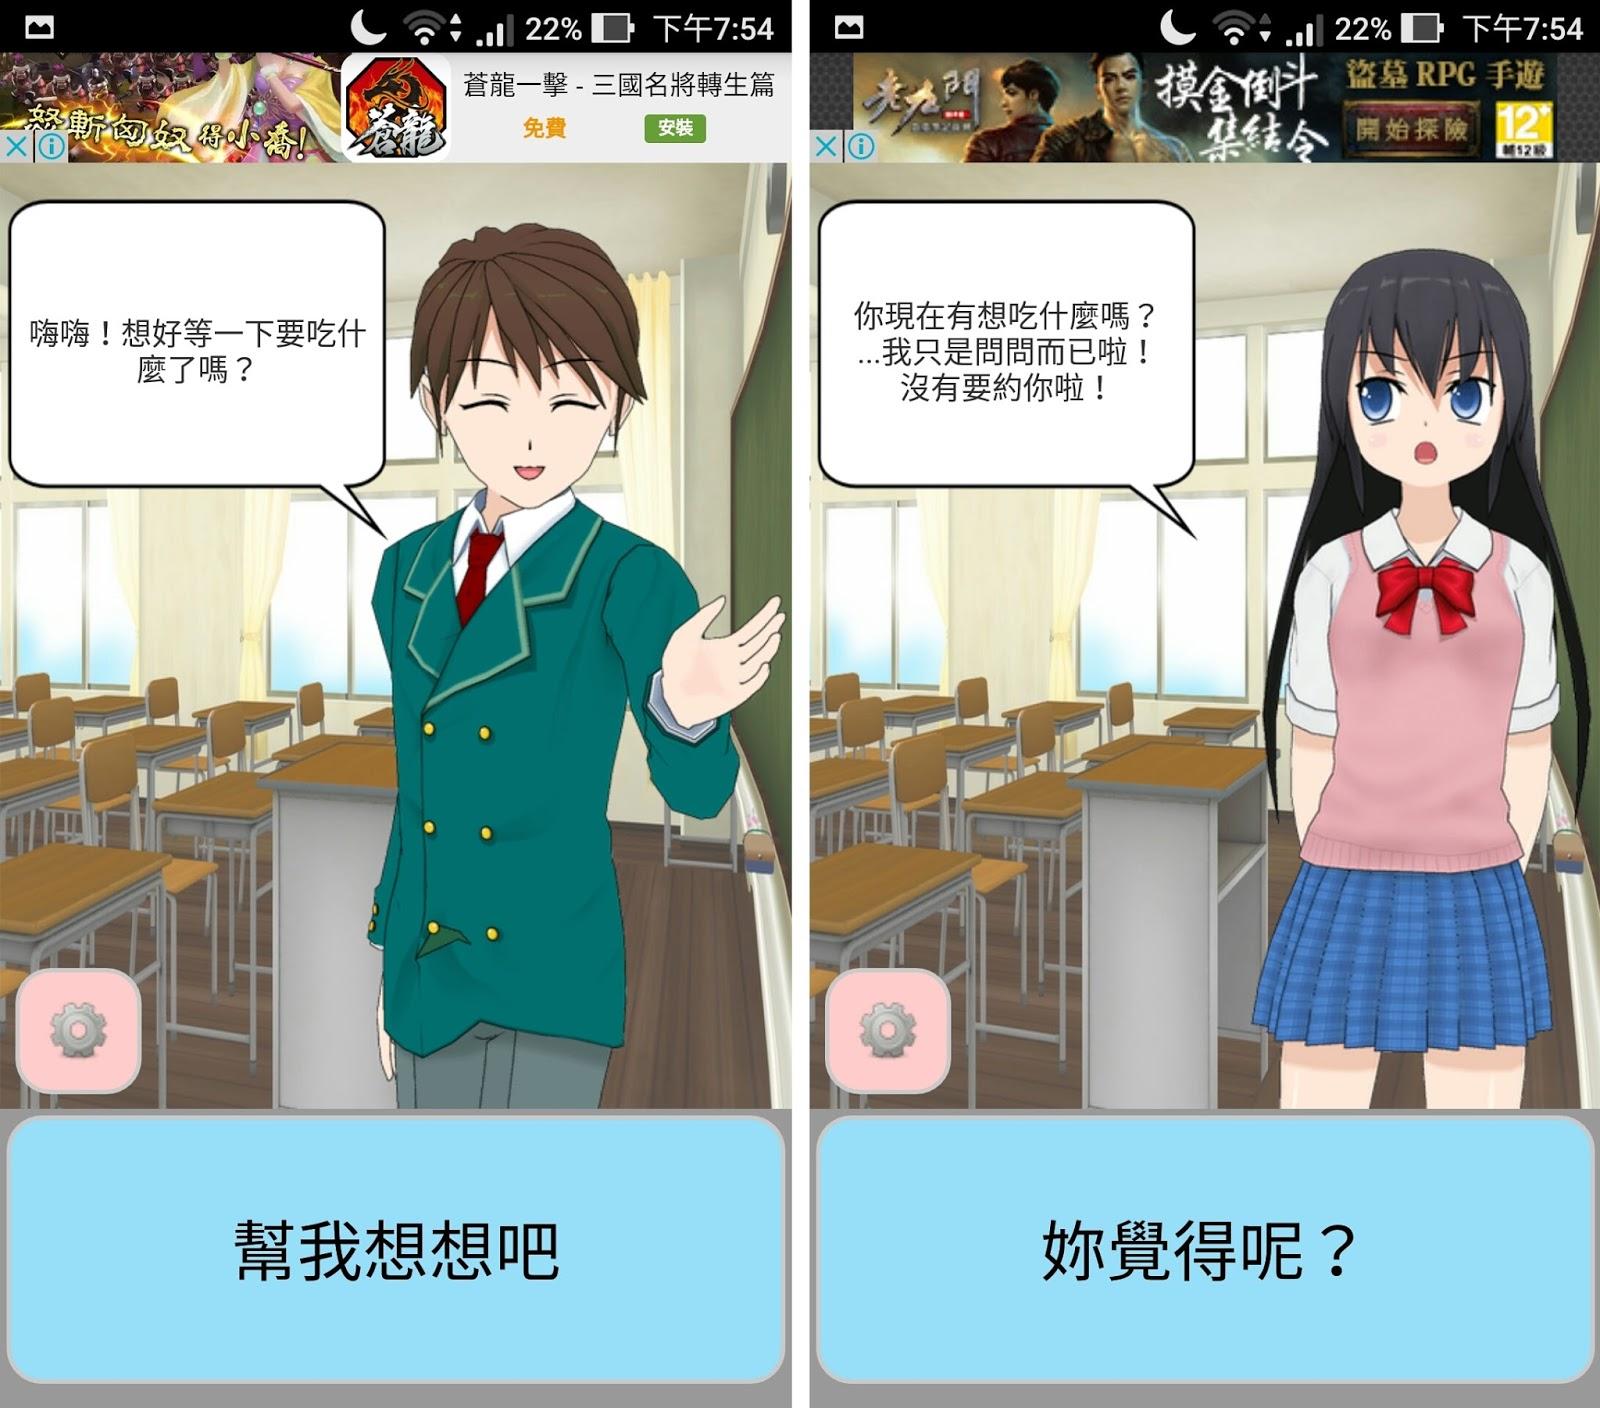 Screenshot 20170422 195451 - 「等下吃什麼?」總是猶豫不決,就讓虛擬女友幫你決定!